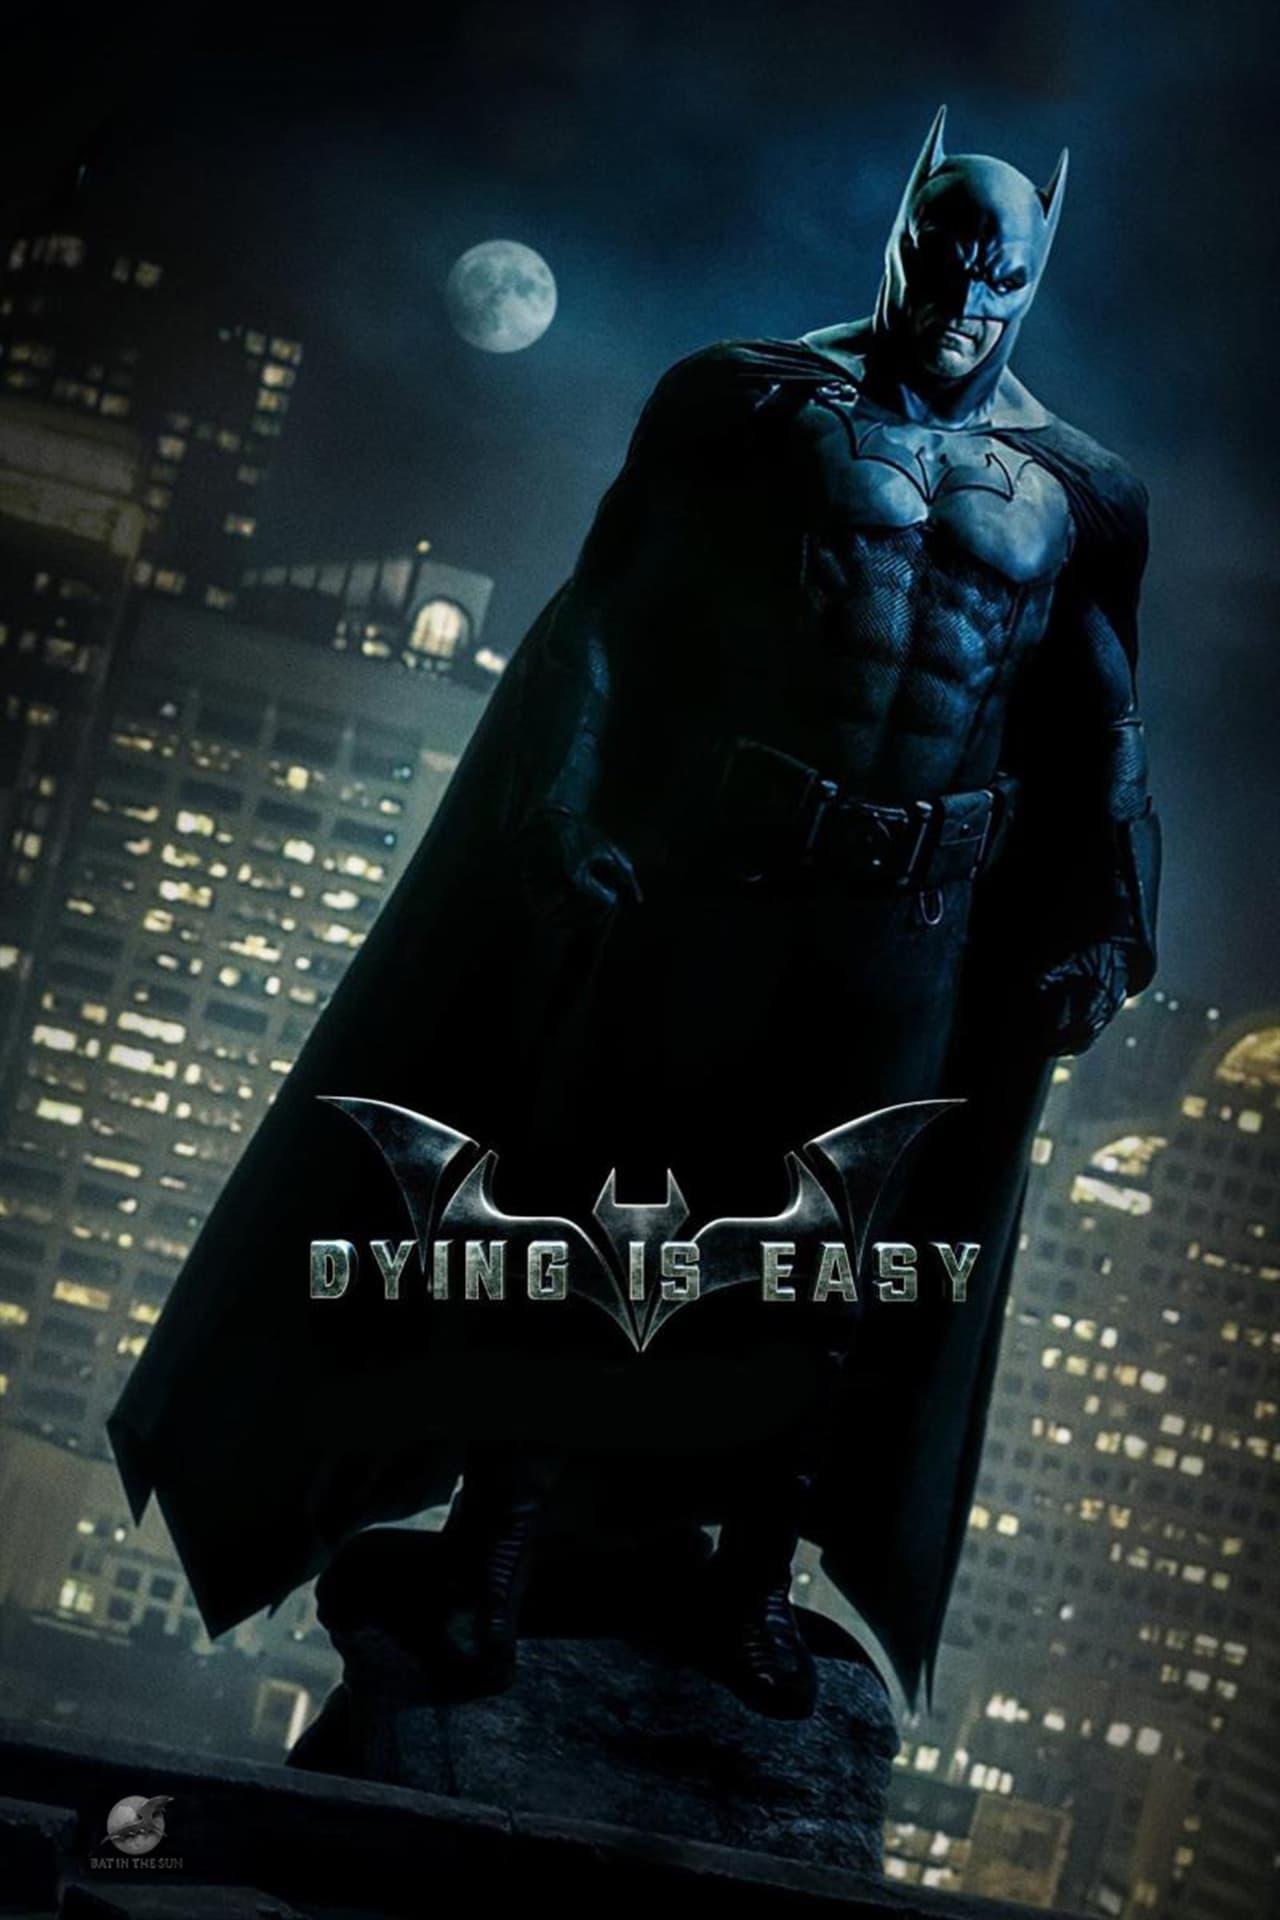 Batman: Dying Is Easy